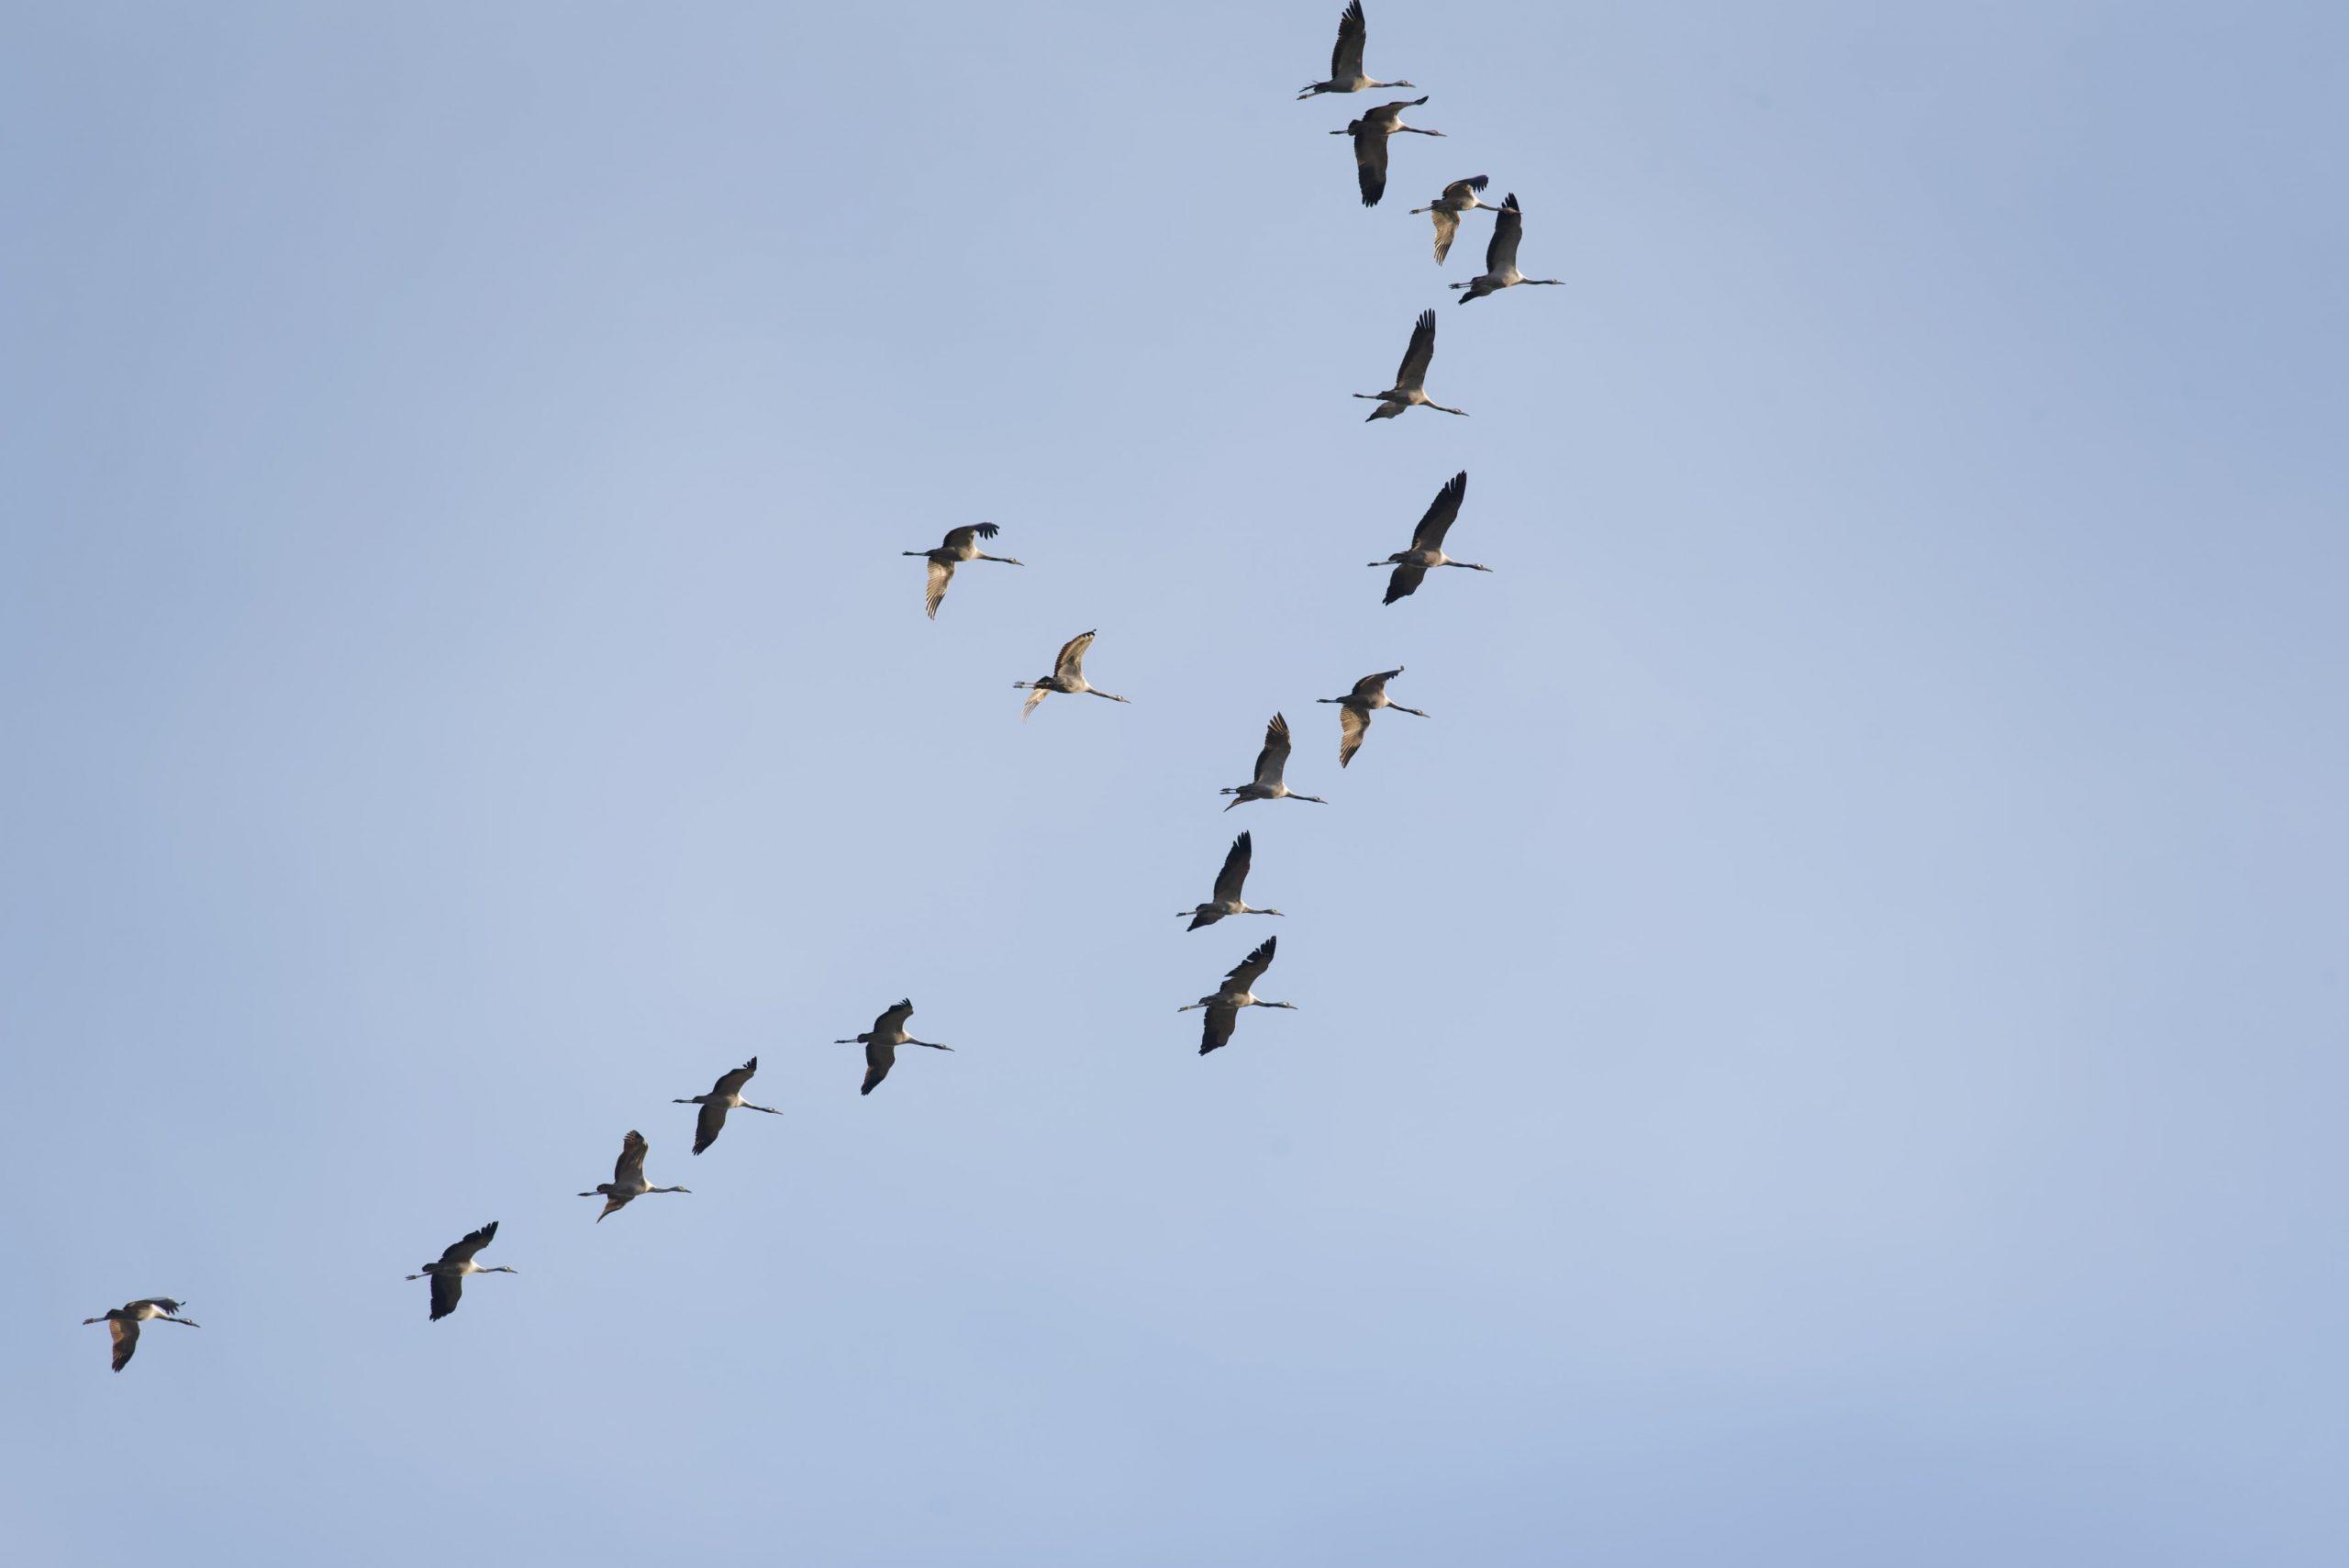 VSPCA migratory bird protection project